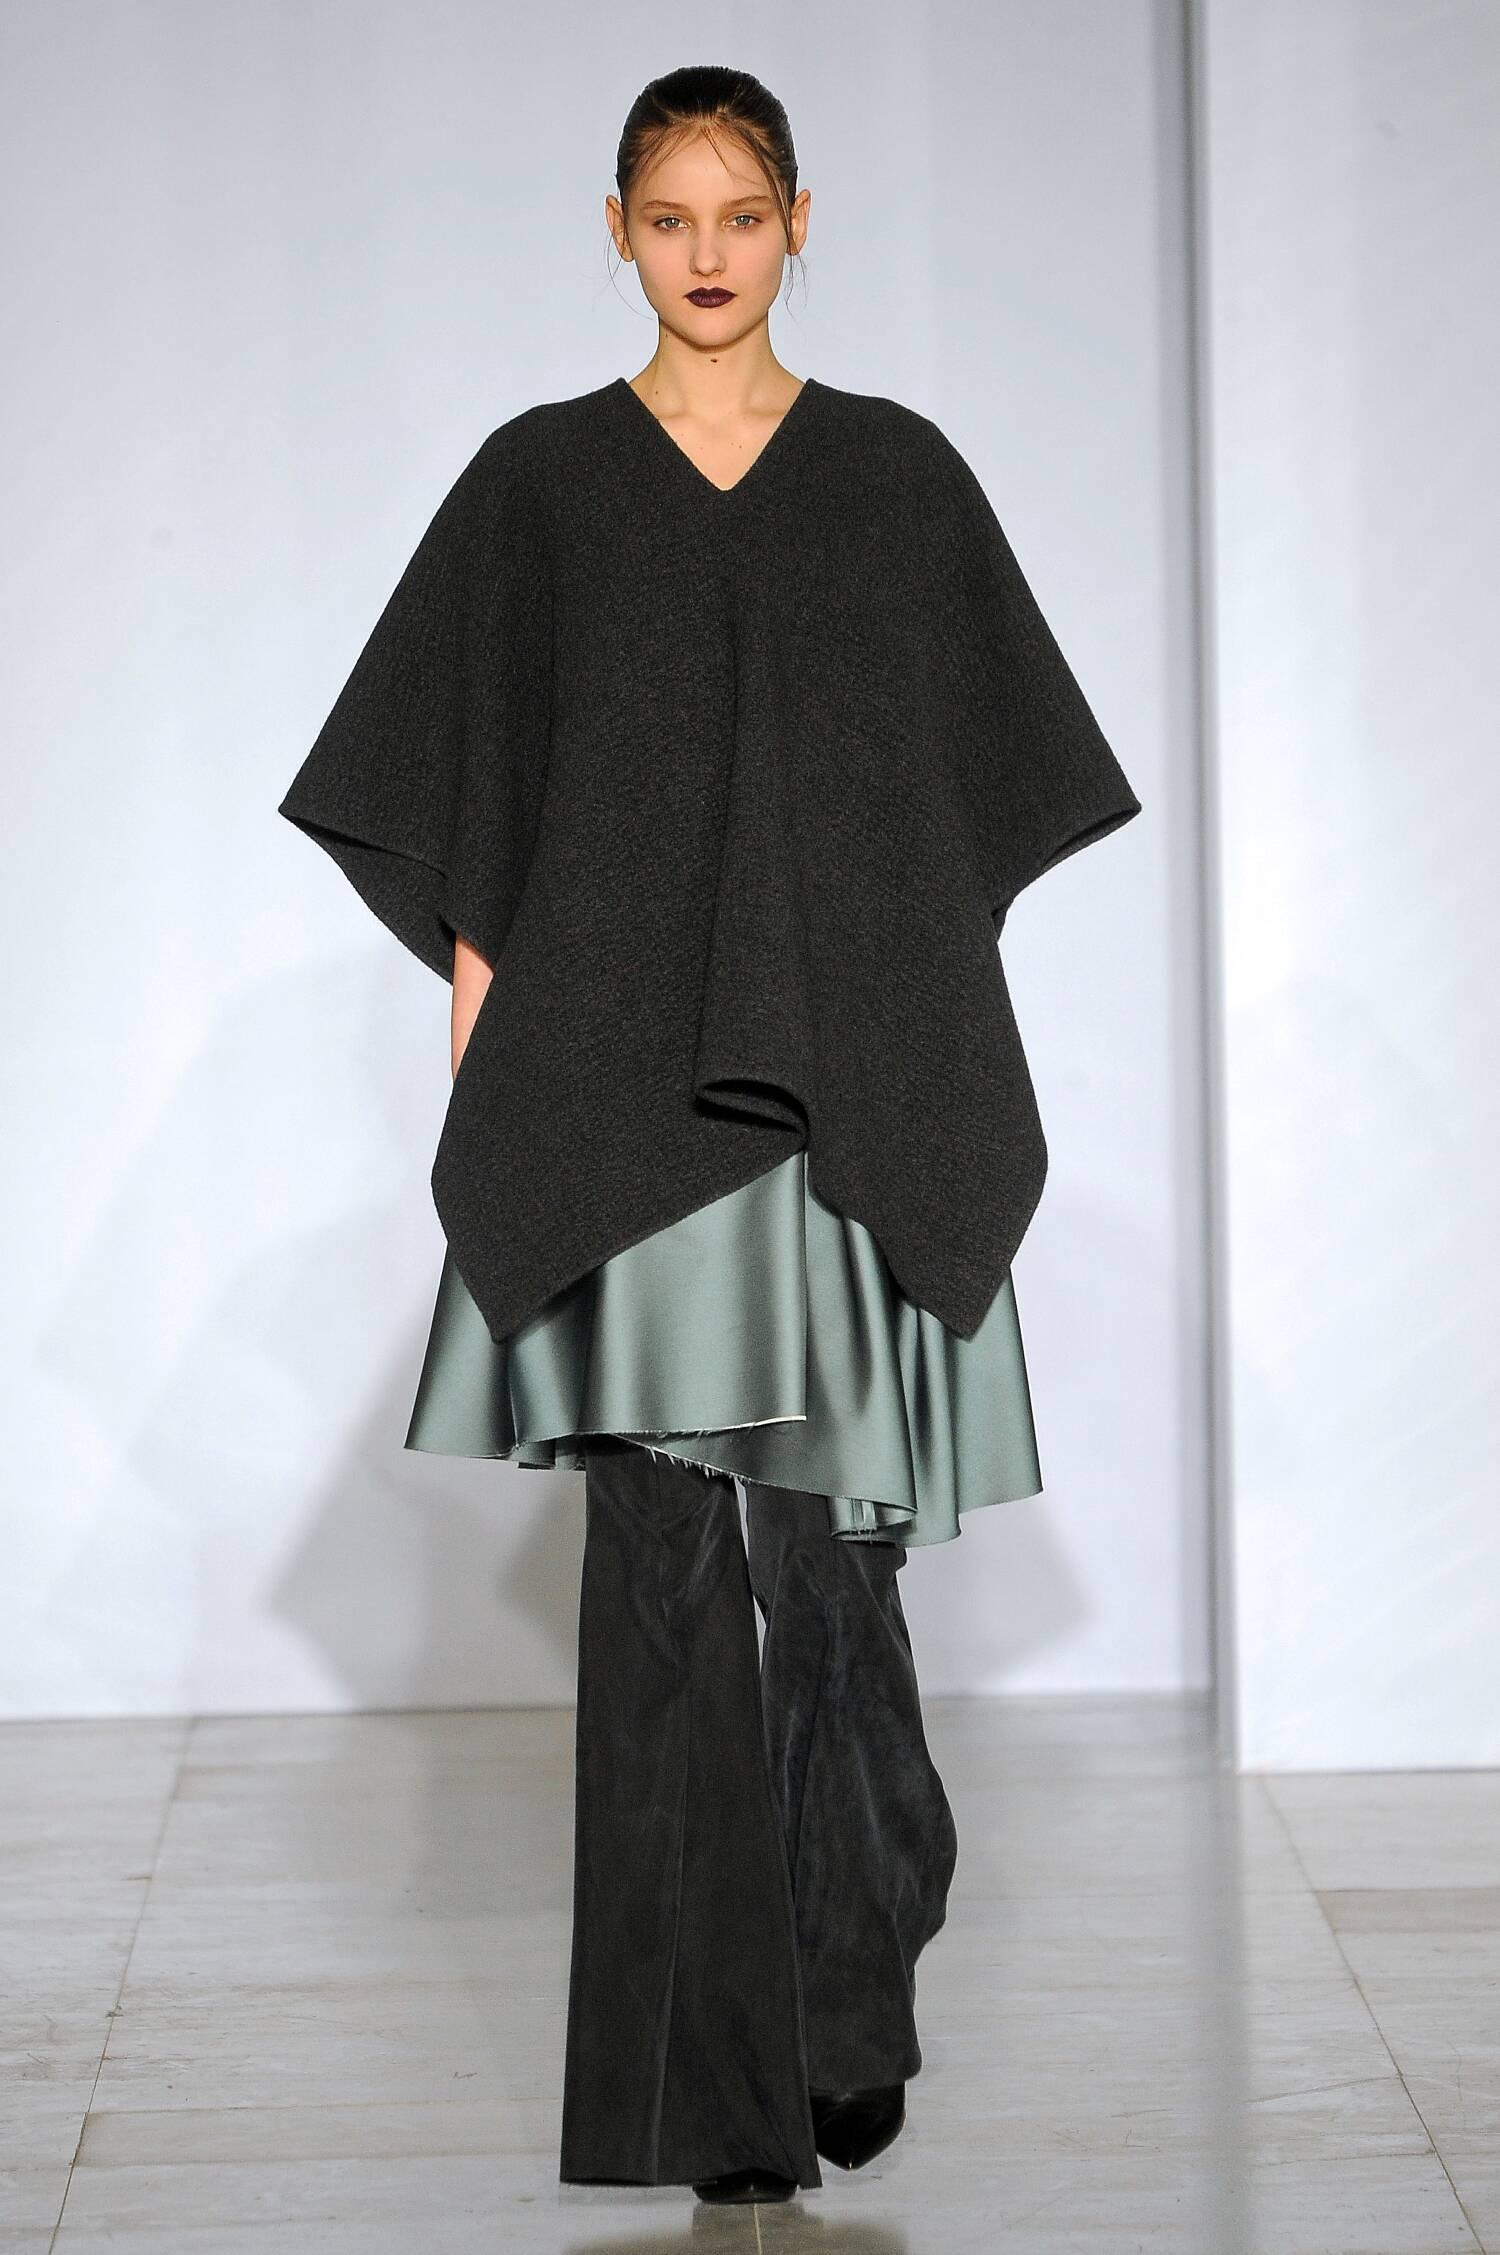 Yang Li Fall Winter 2015 16 Womenswear Collection Paris Fashion Week Fashion Show